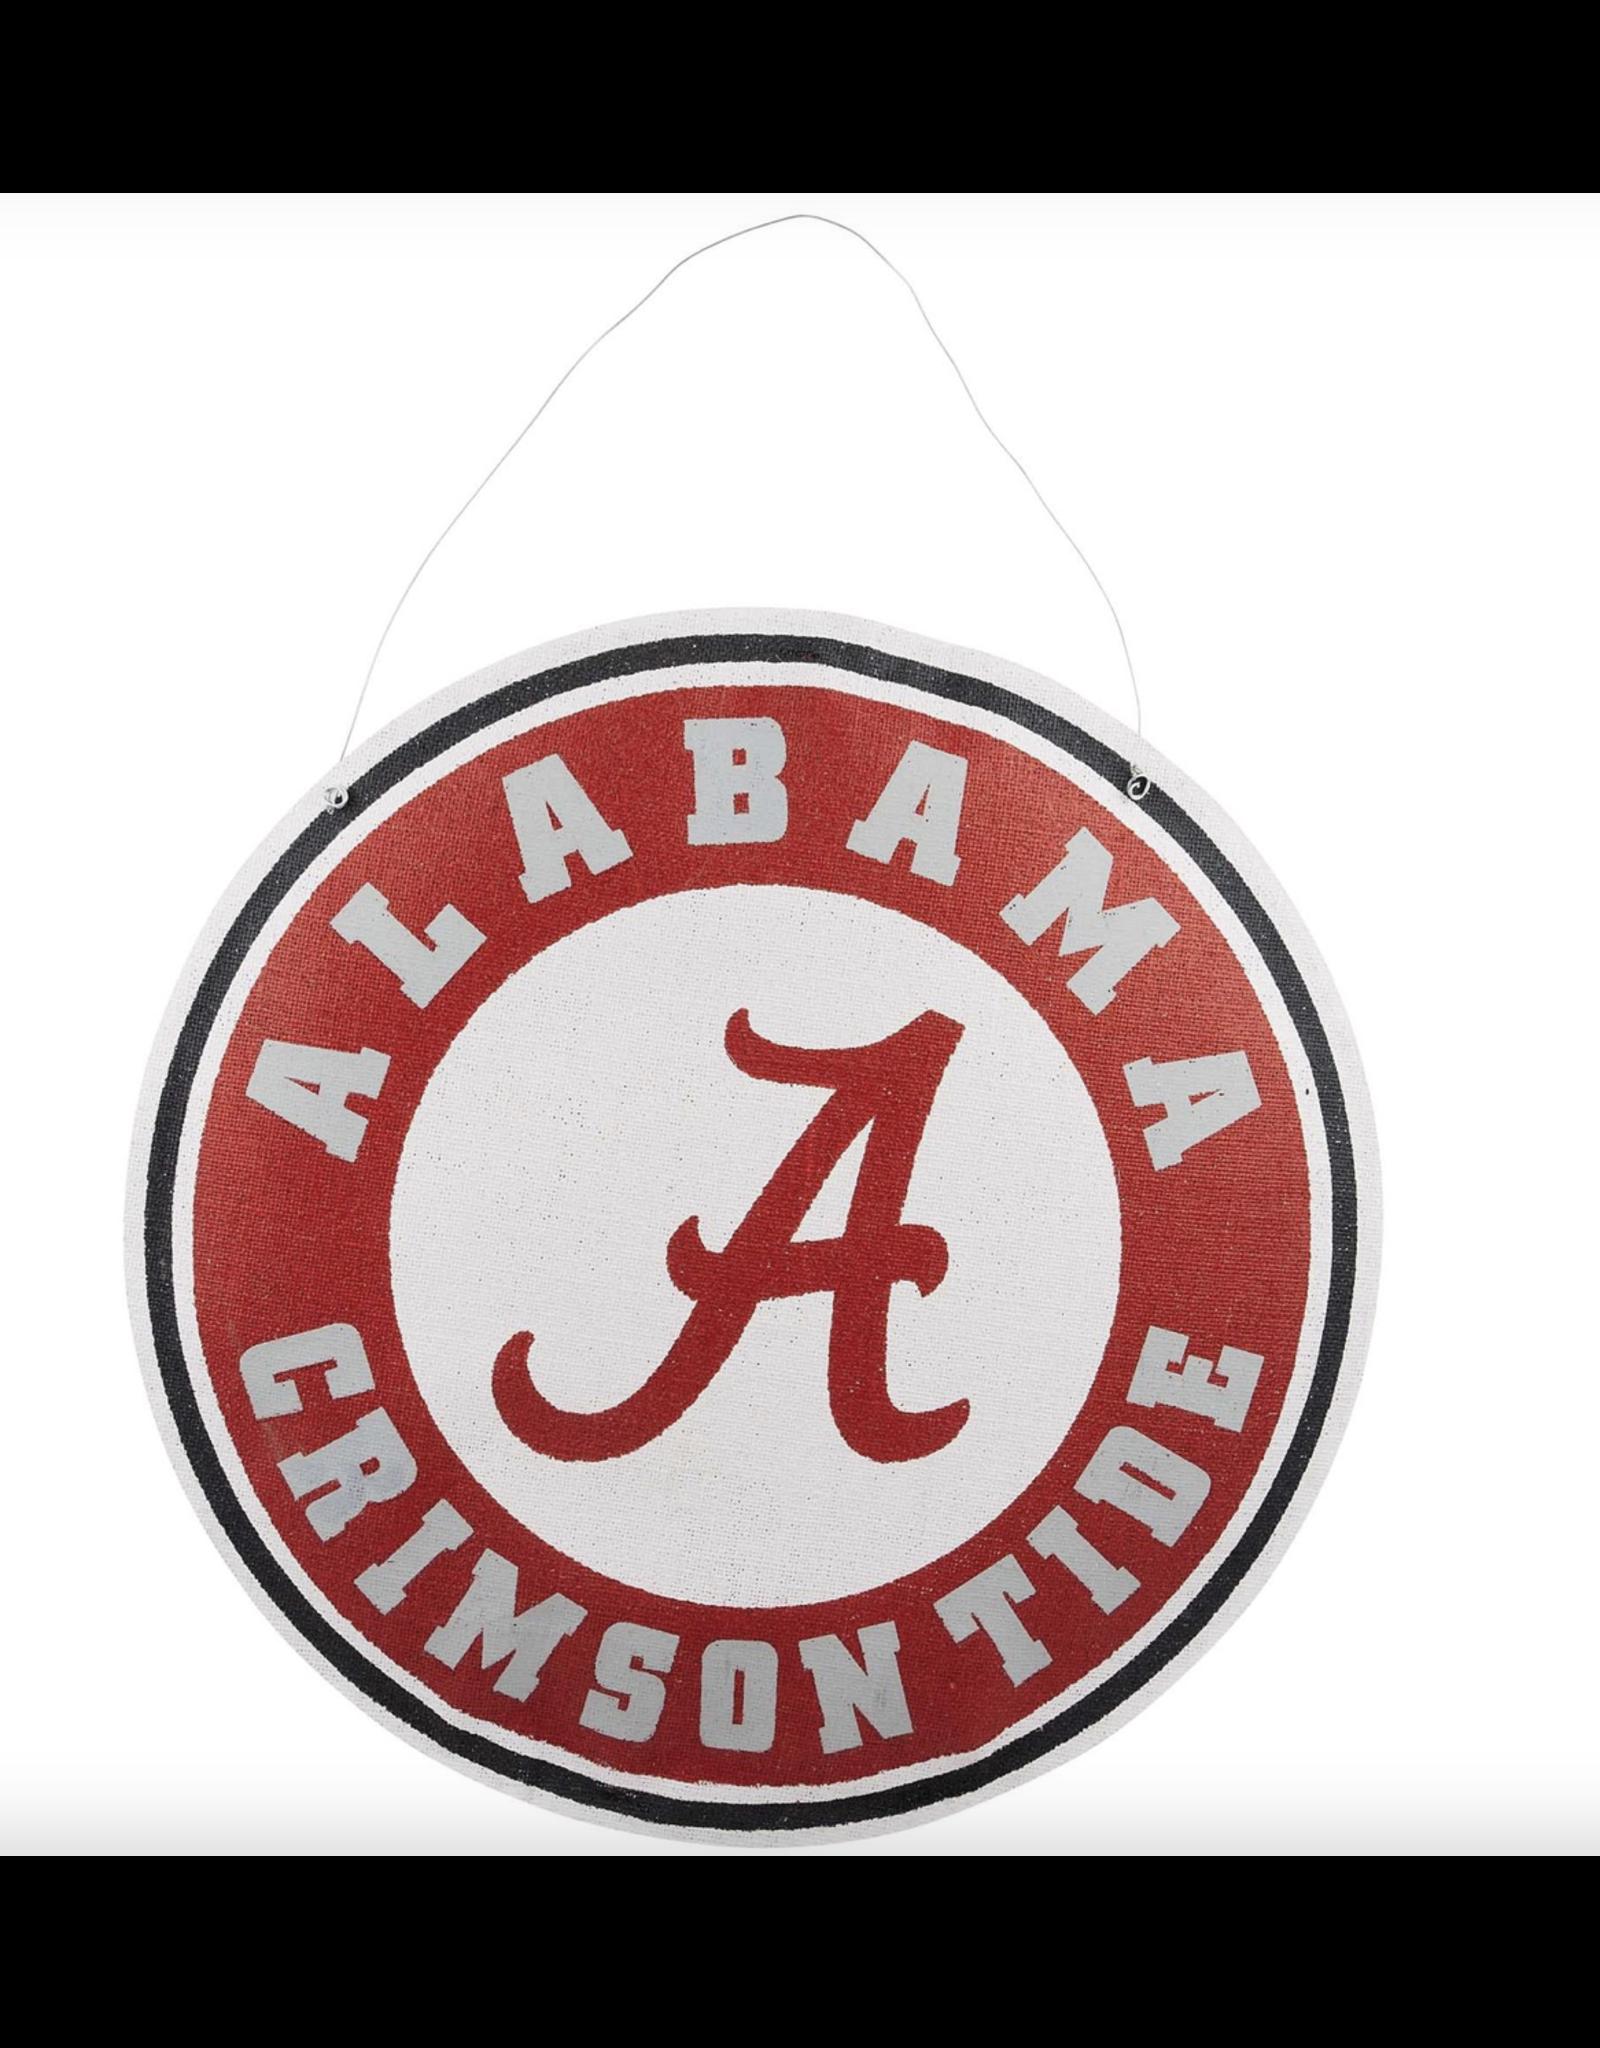 Glory Haus Burlee Alabama Logo